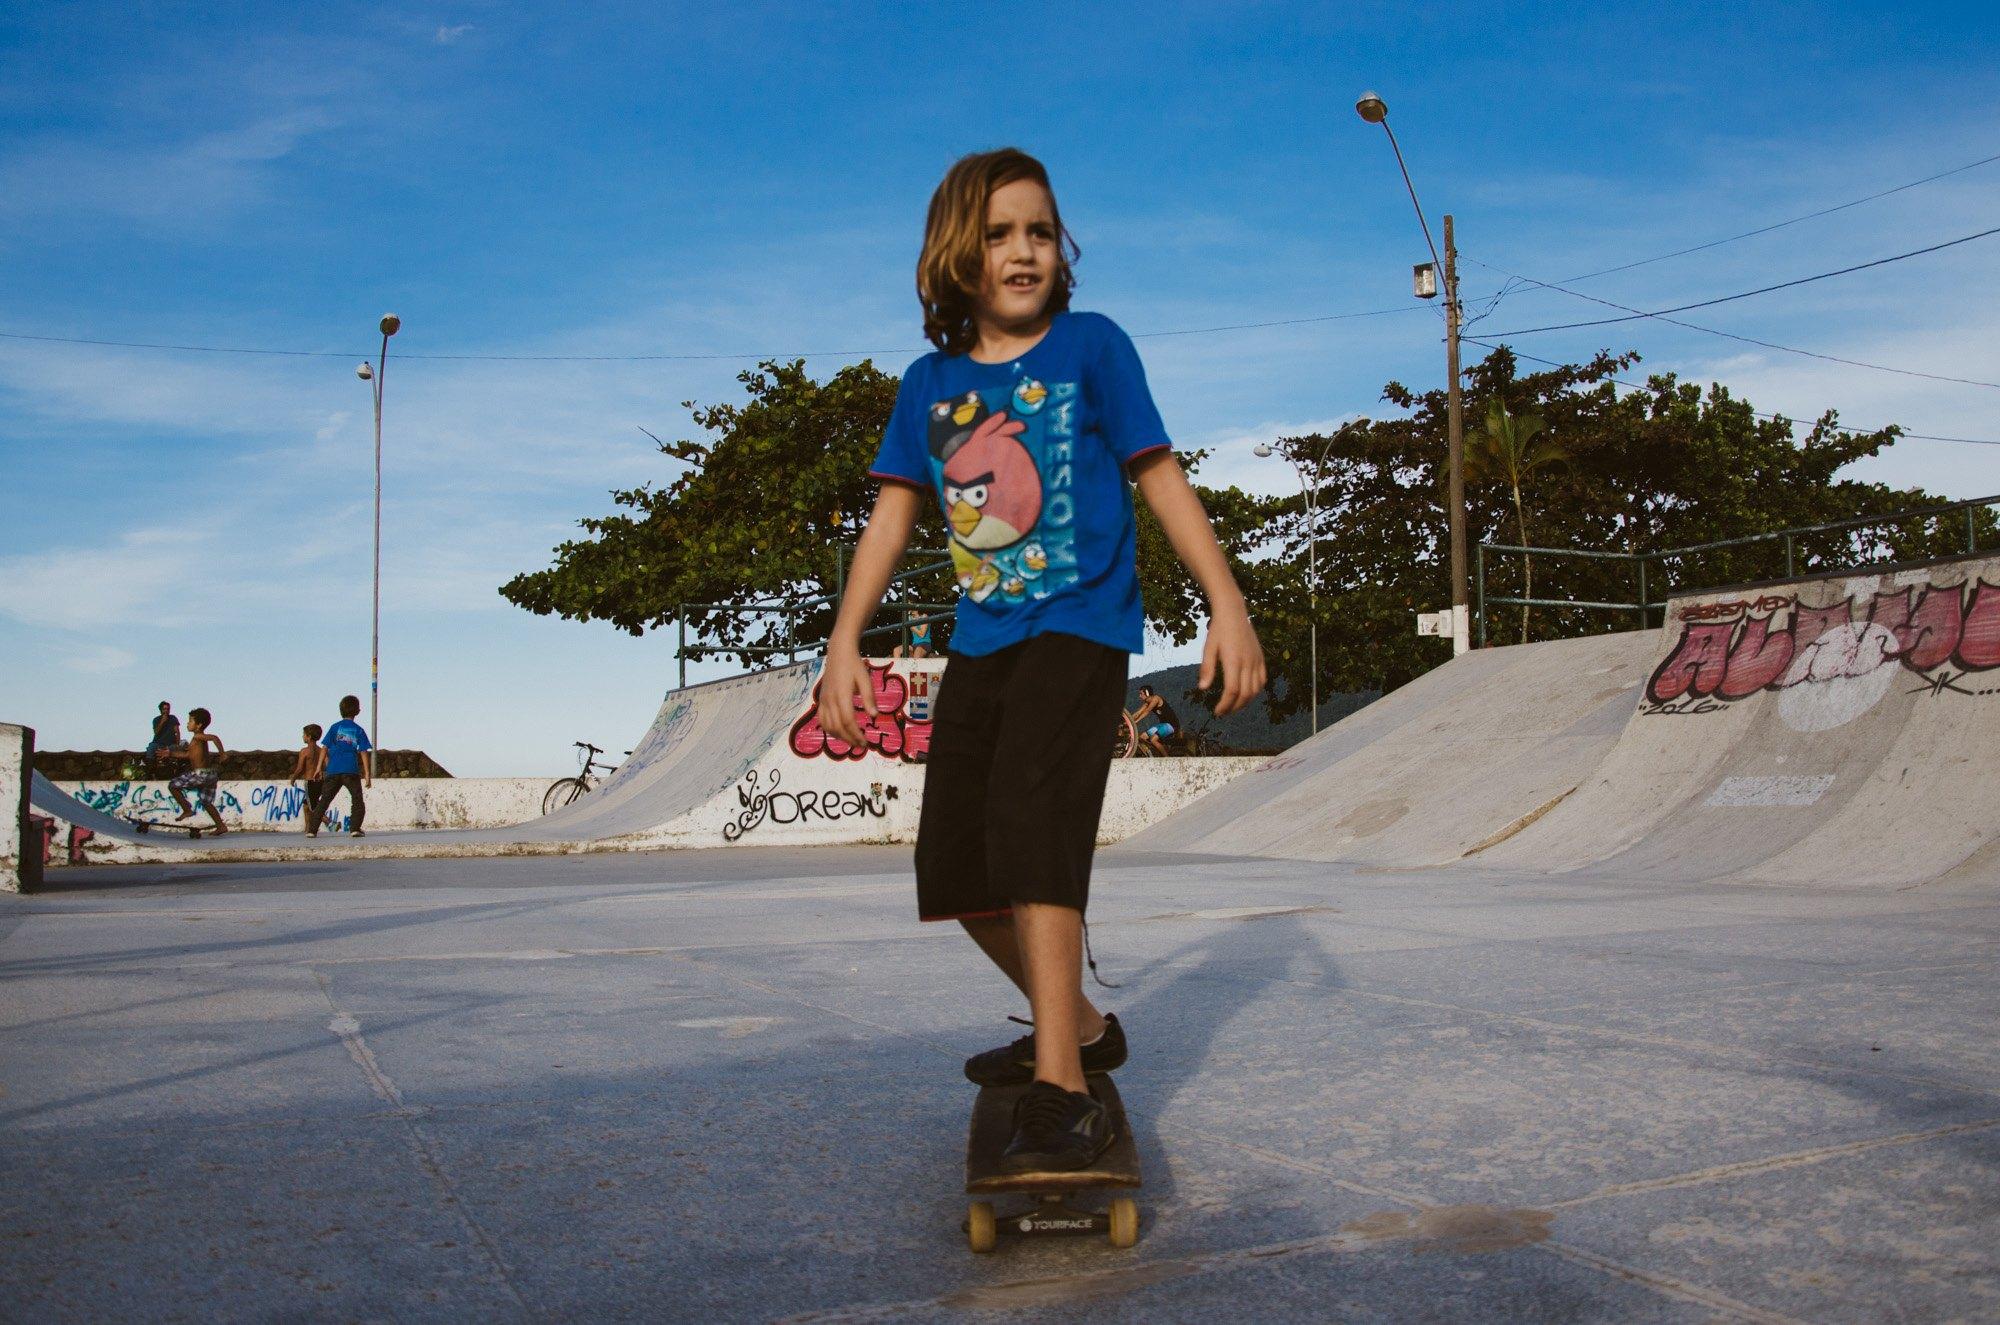 pista-skate-itagua-ubatuba-daniela-seco-9